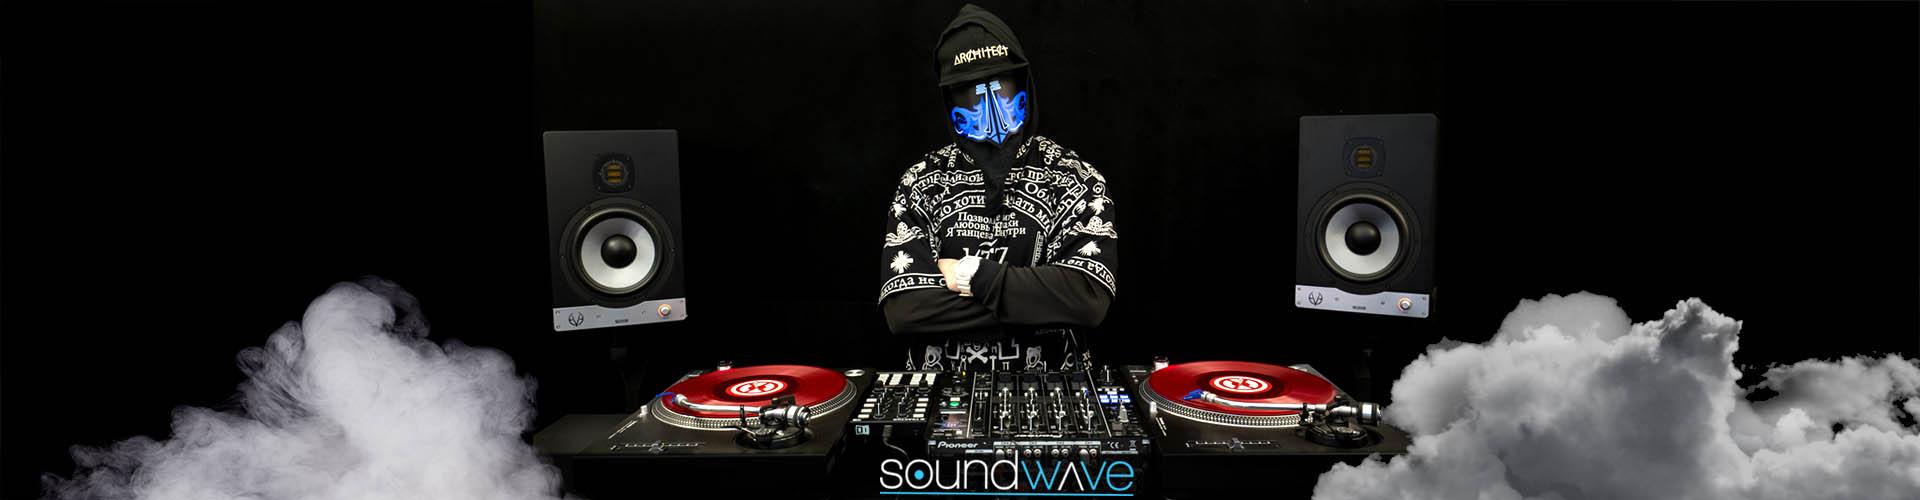 https://dj-architect.com/wp-content/uploads/2017/01/Soundwave-Late-Nite-Session.jpg